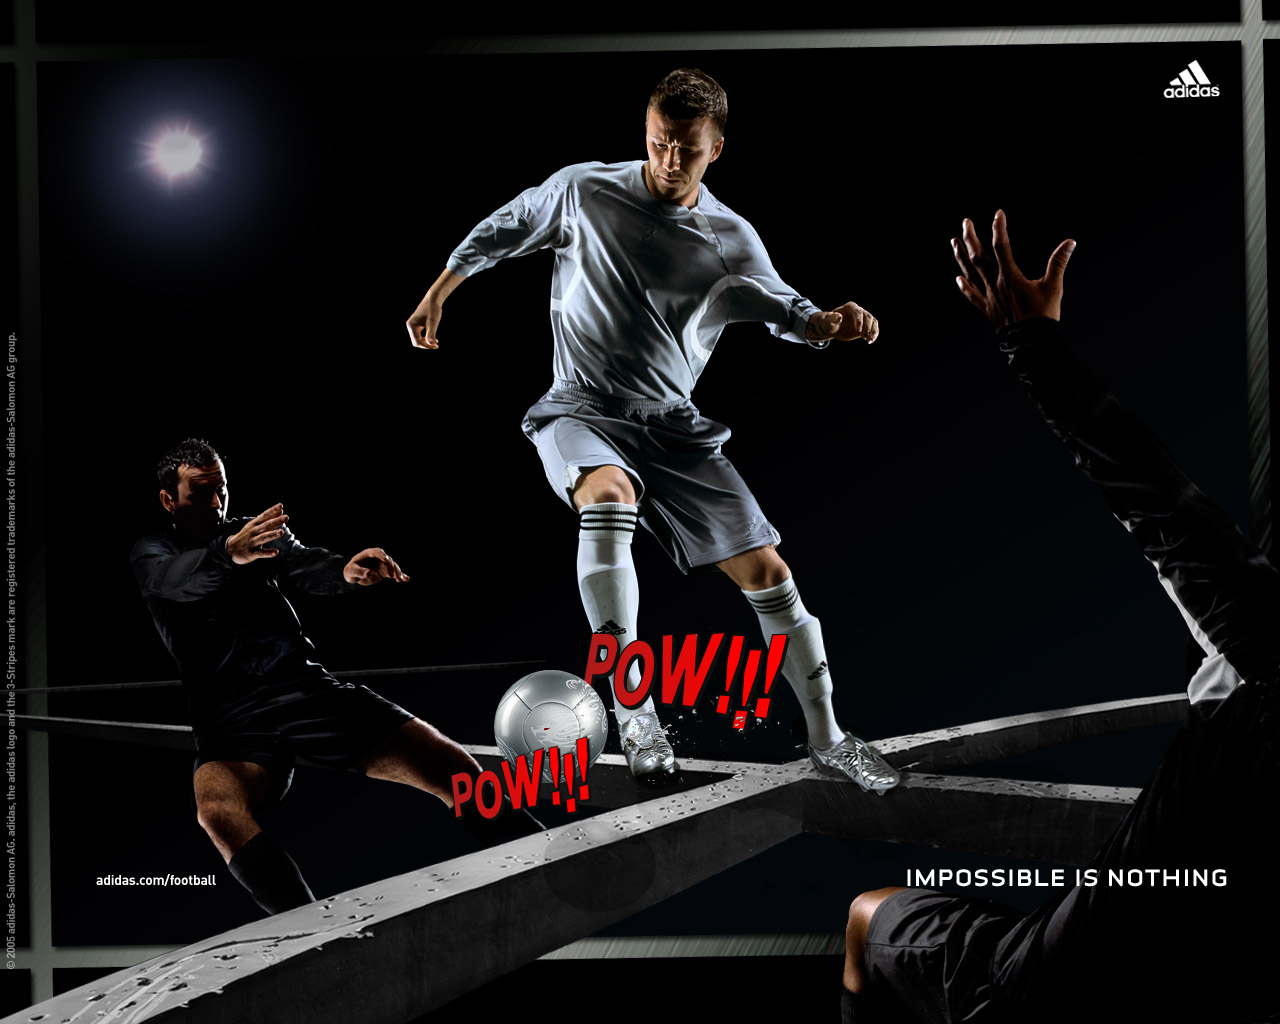 newest 929fb 8e87d adidas Football TV